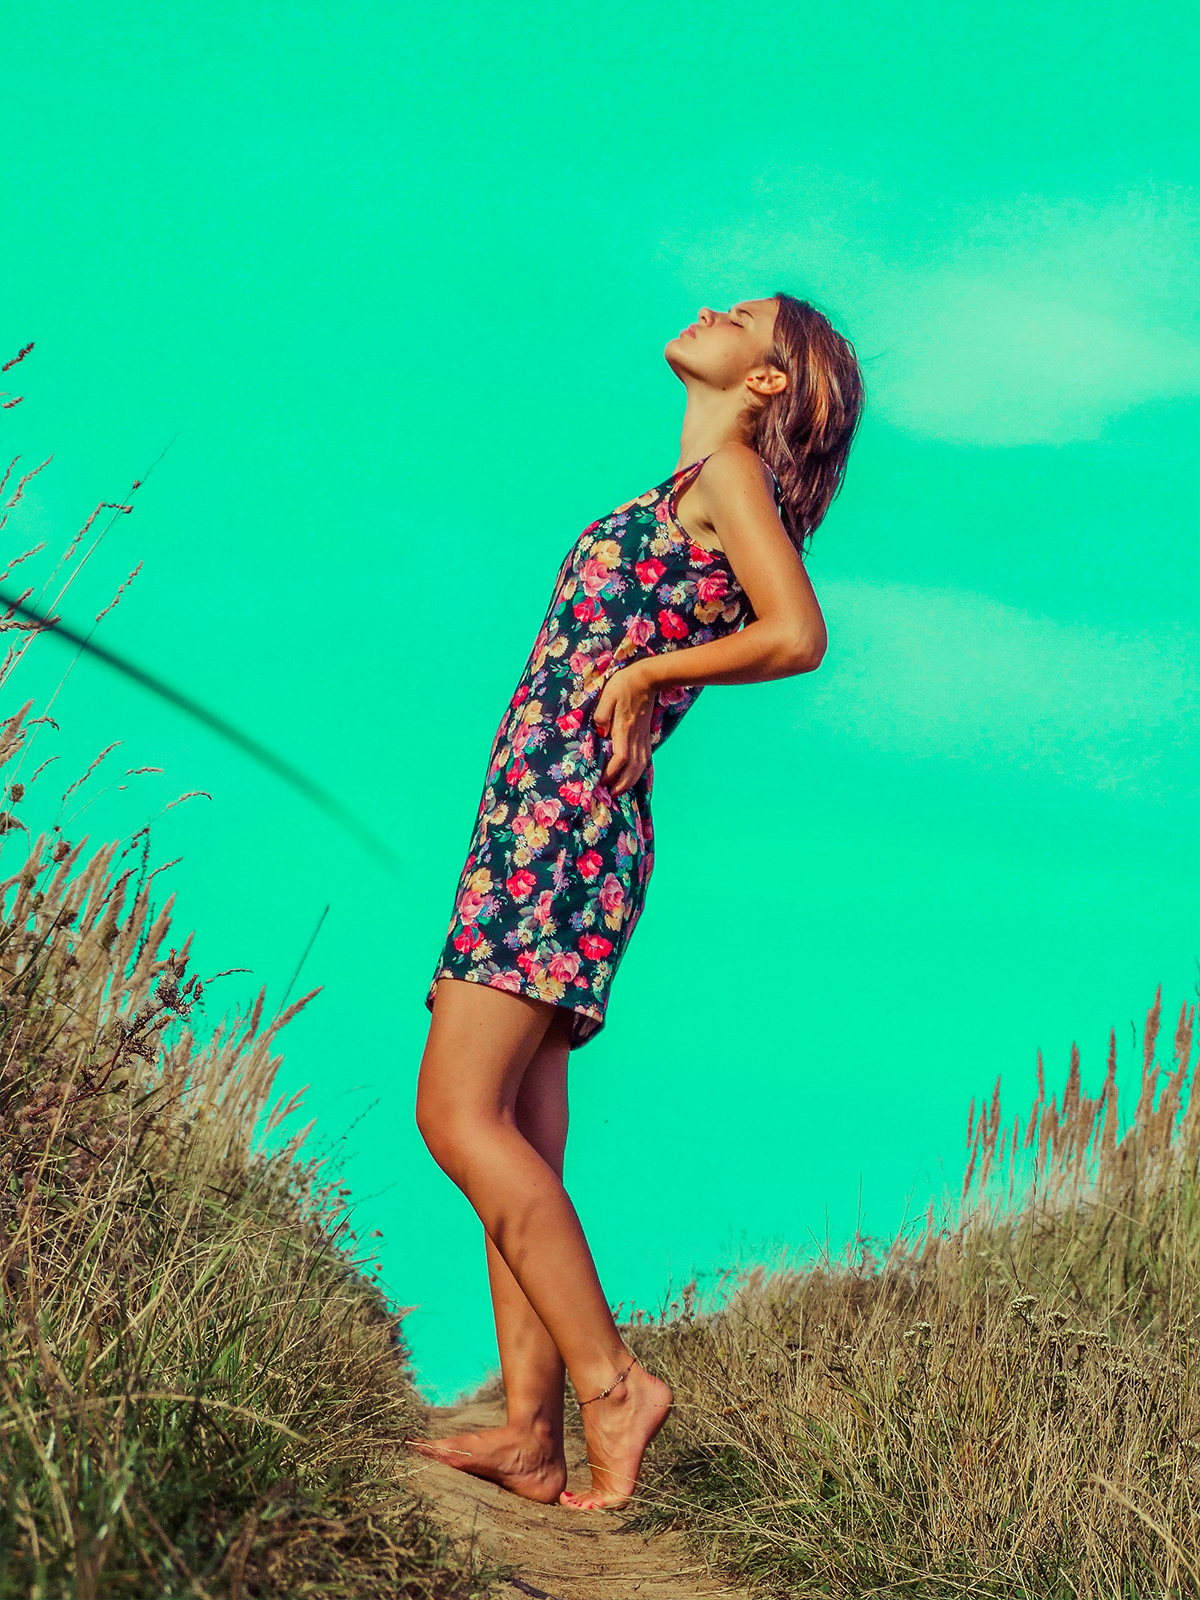 Turquoise, portraiture by Cristina Schek (12)